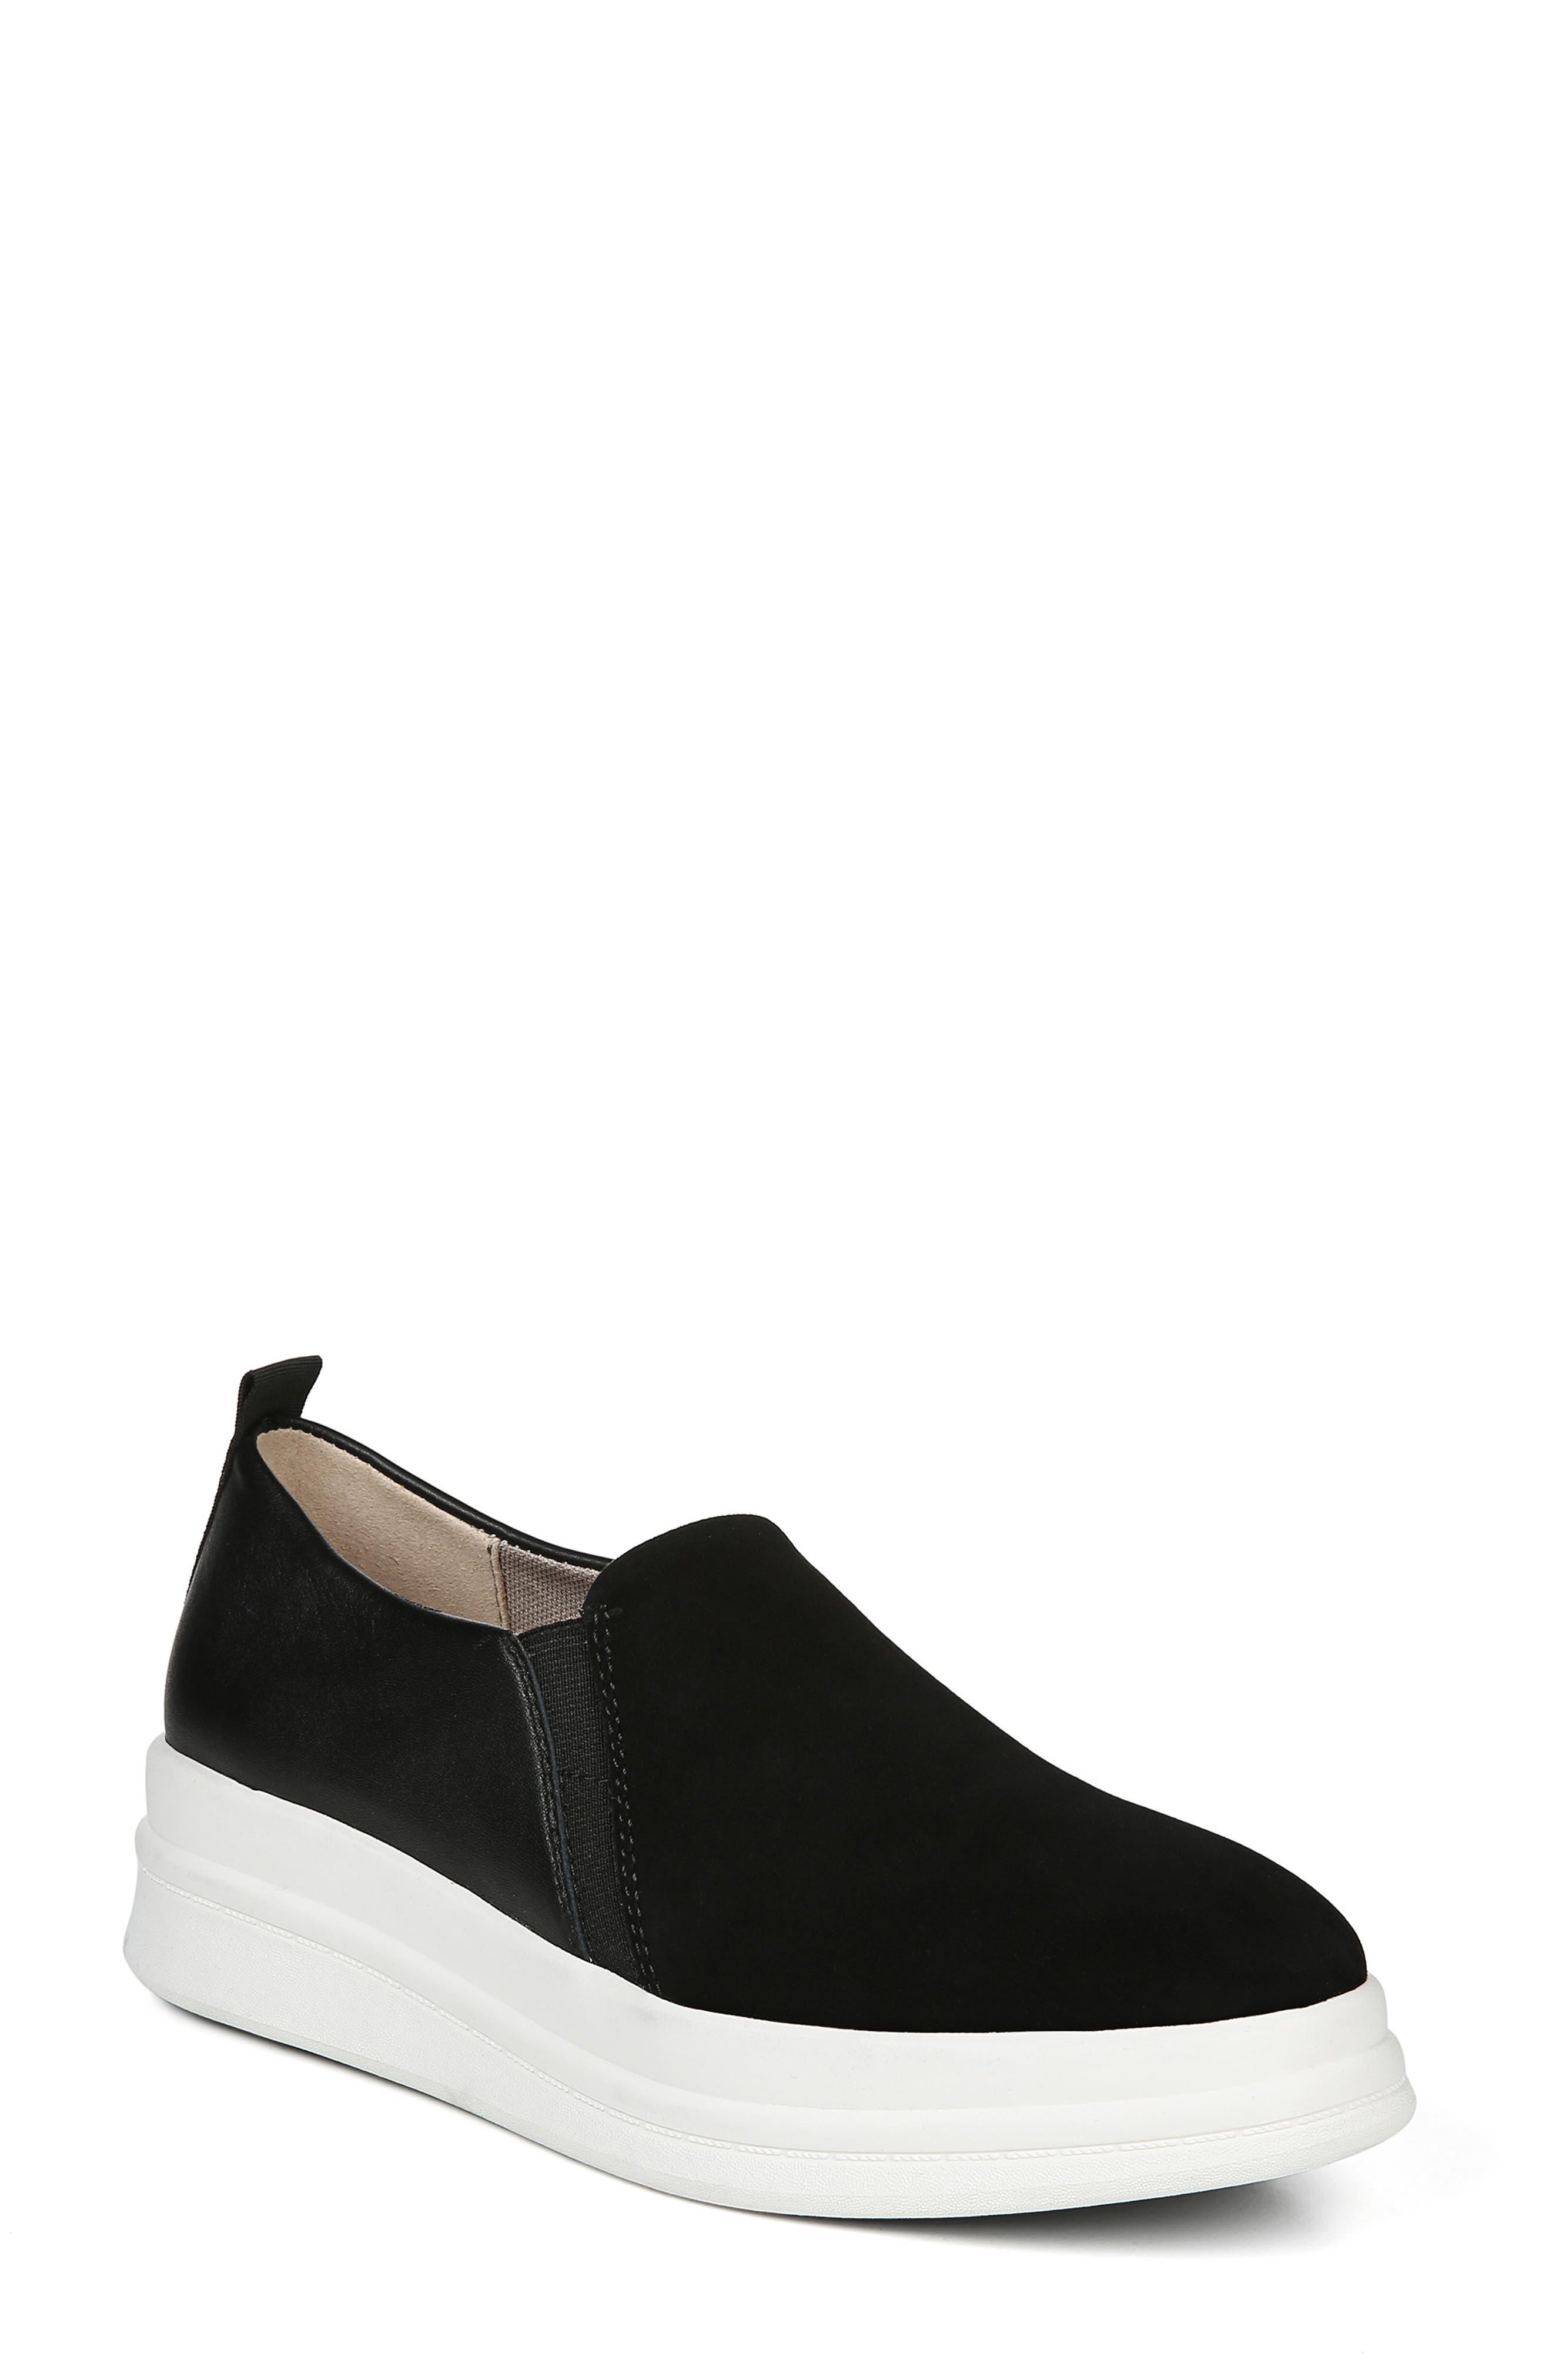 Yola Slip-On Sneaker, Main, color, BLACK SUEDE/ LEATHER